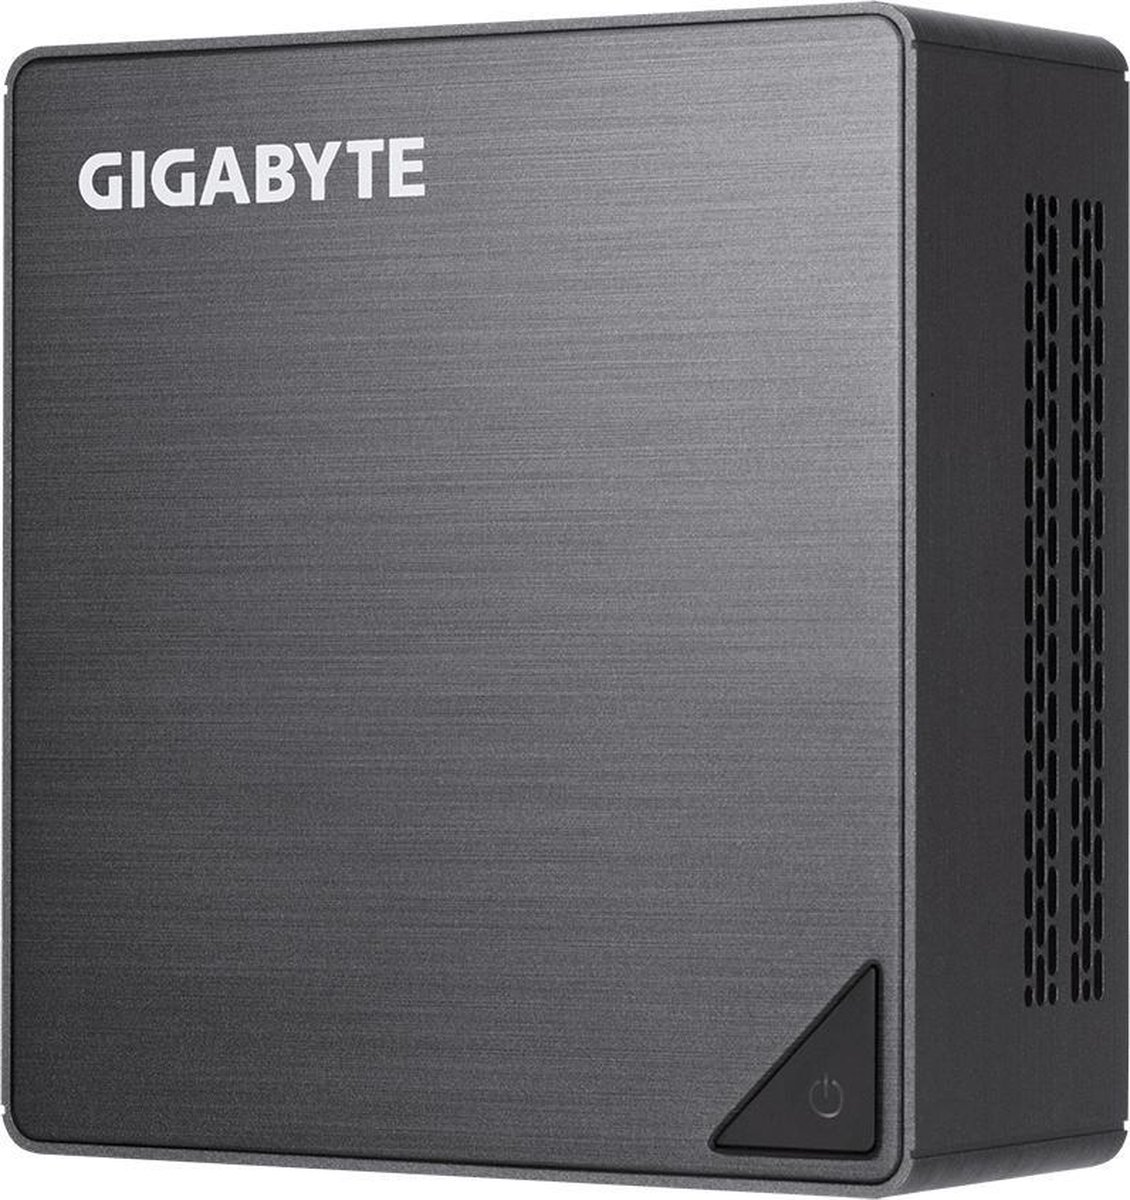 Gigabyte SO-DDR4 M-DP+M2+GLN+WIFI+USB3.1 IN Zwart BGA 1356 i3-8130U 2,2 GHz